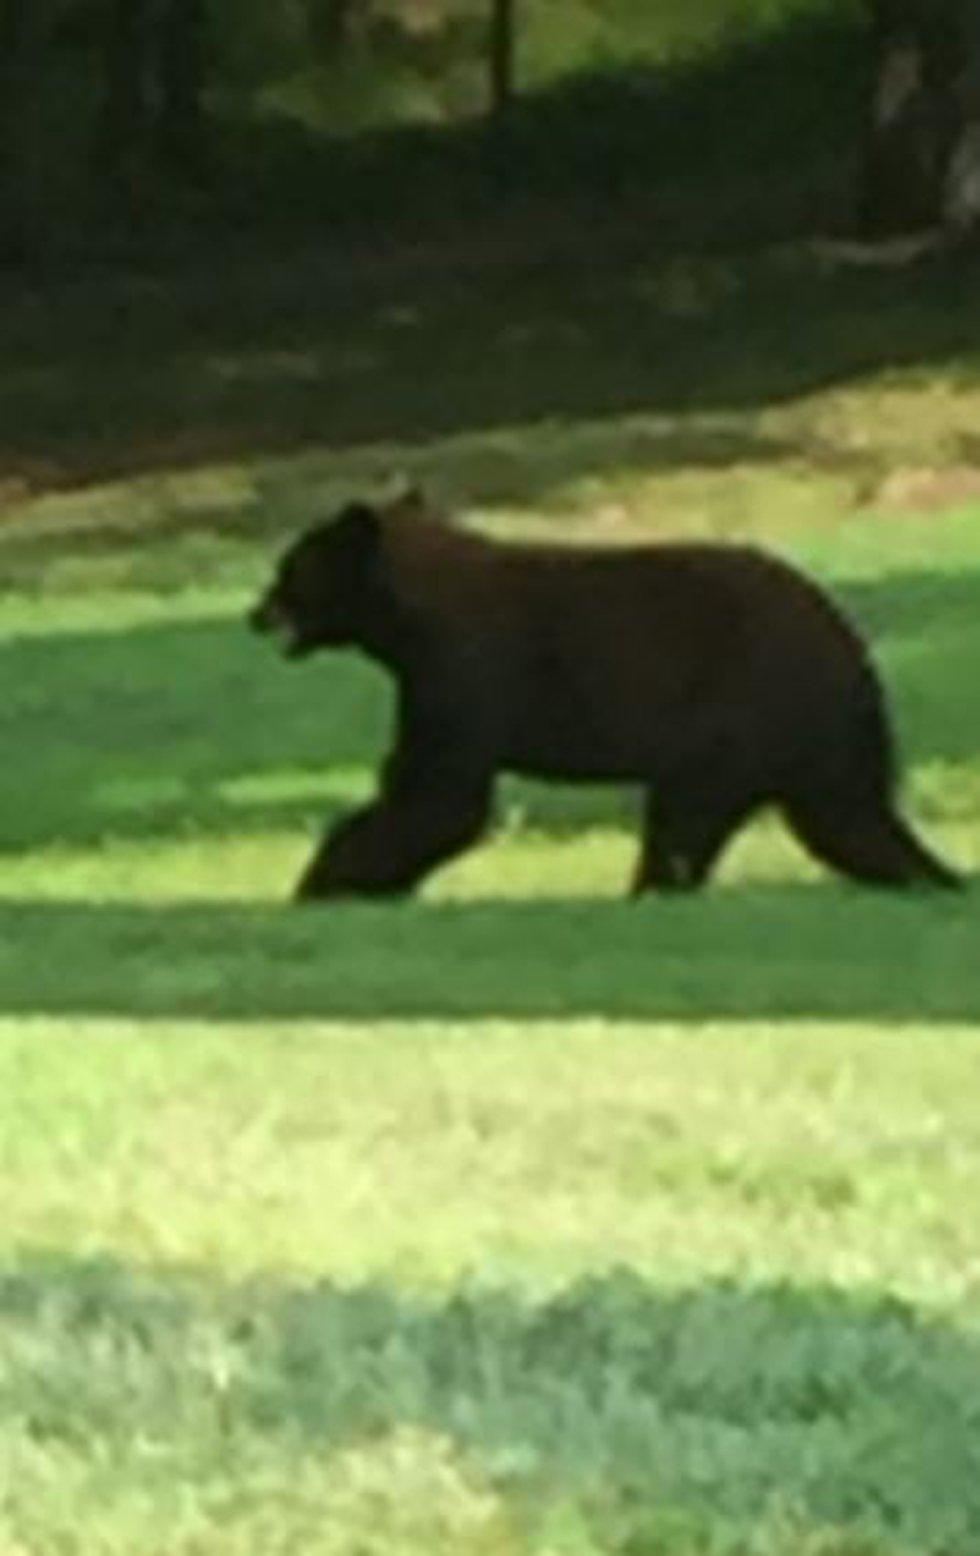 Bear sighting in Dixon